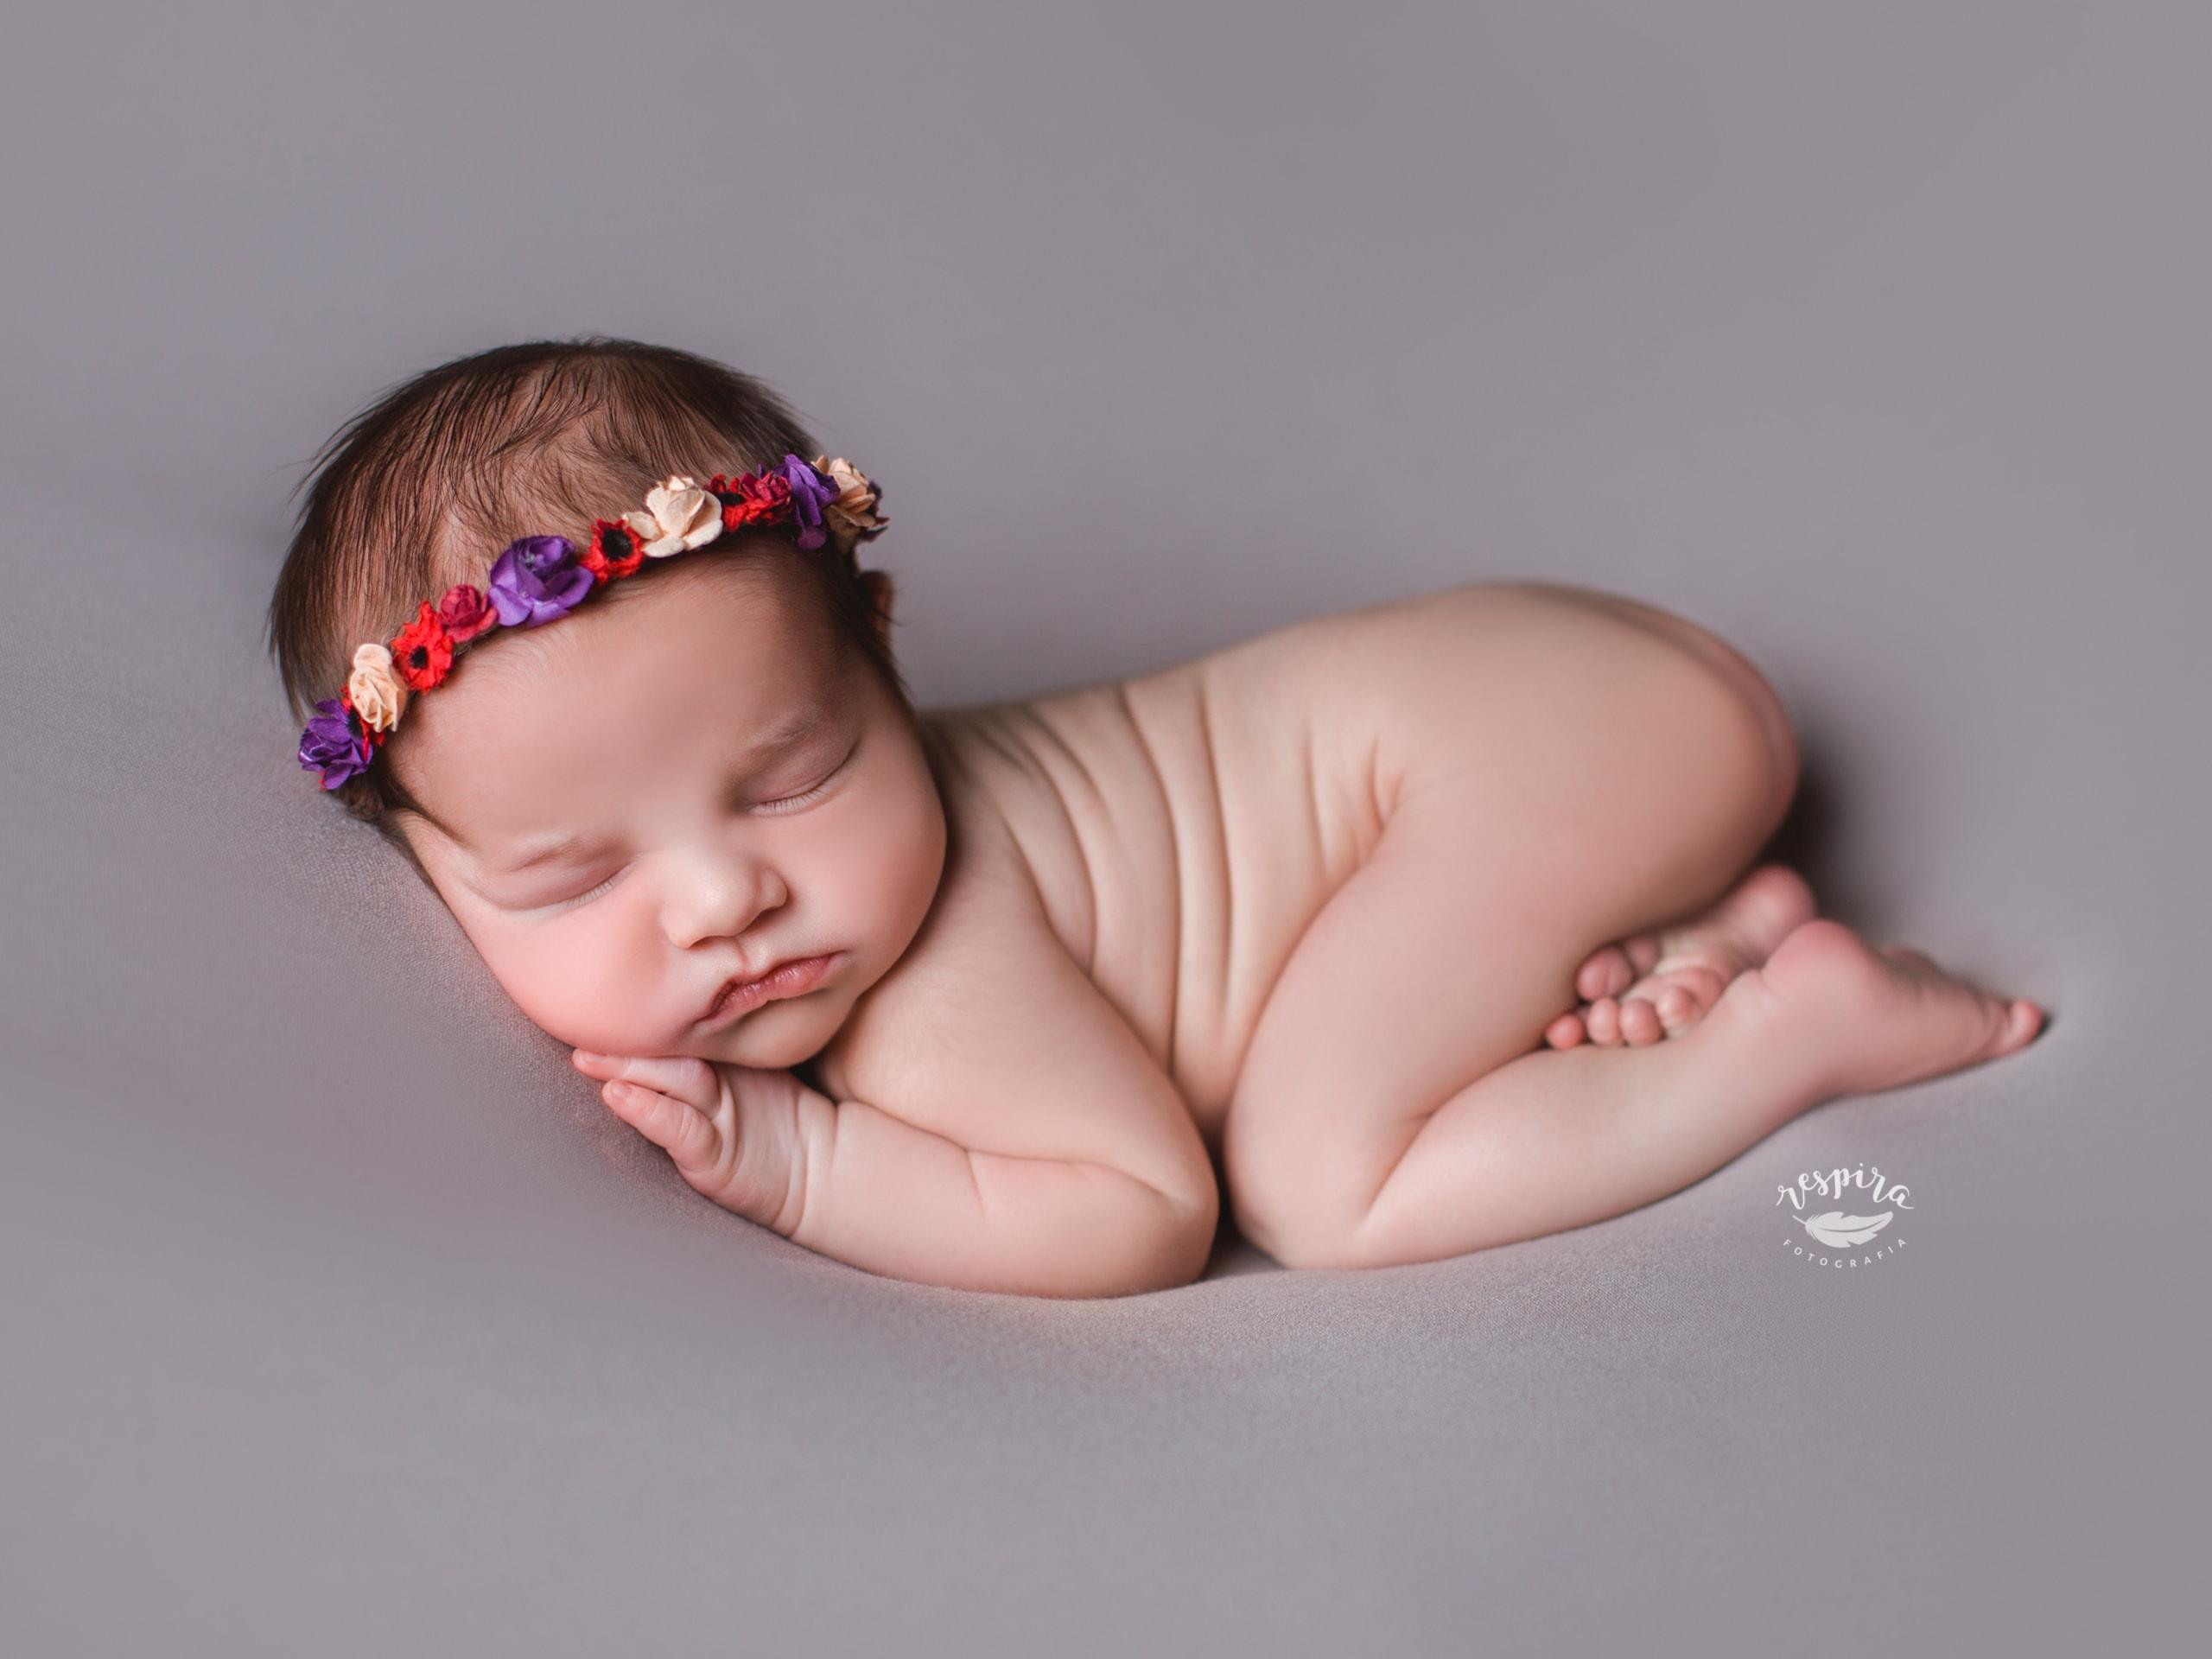 Fotografo newborn en barcelona olesa de montserrat